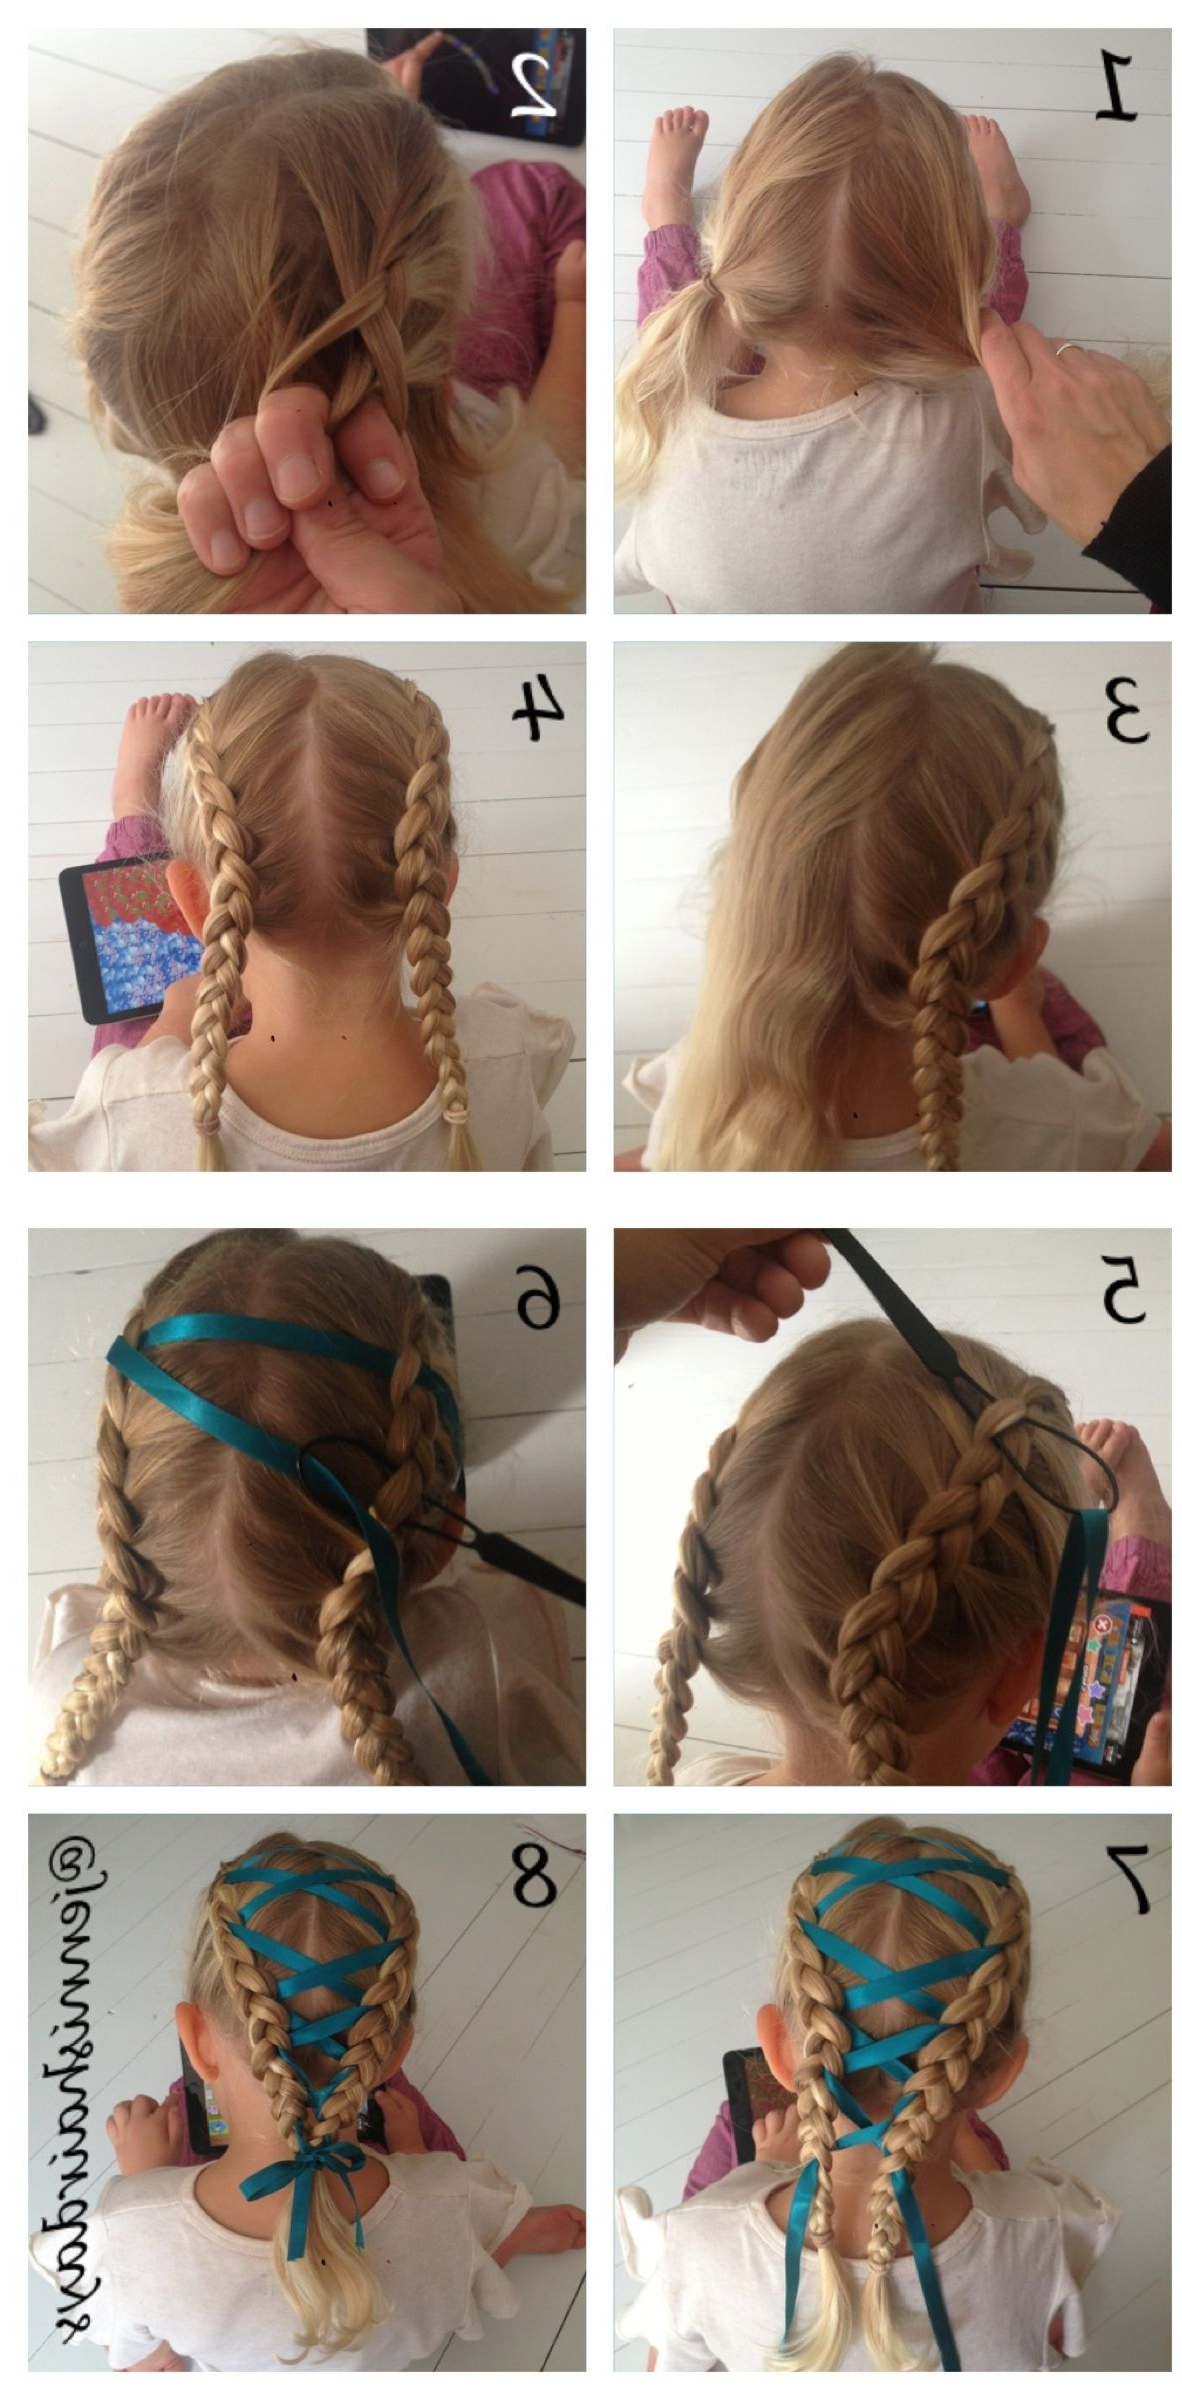 Braids, Braided Hairstyles, Hair Throughout Latest Corset Braid Hairstyles (View 5 of 20)